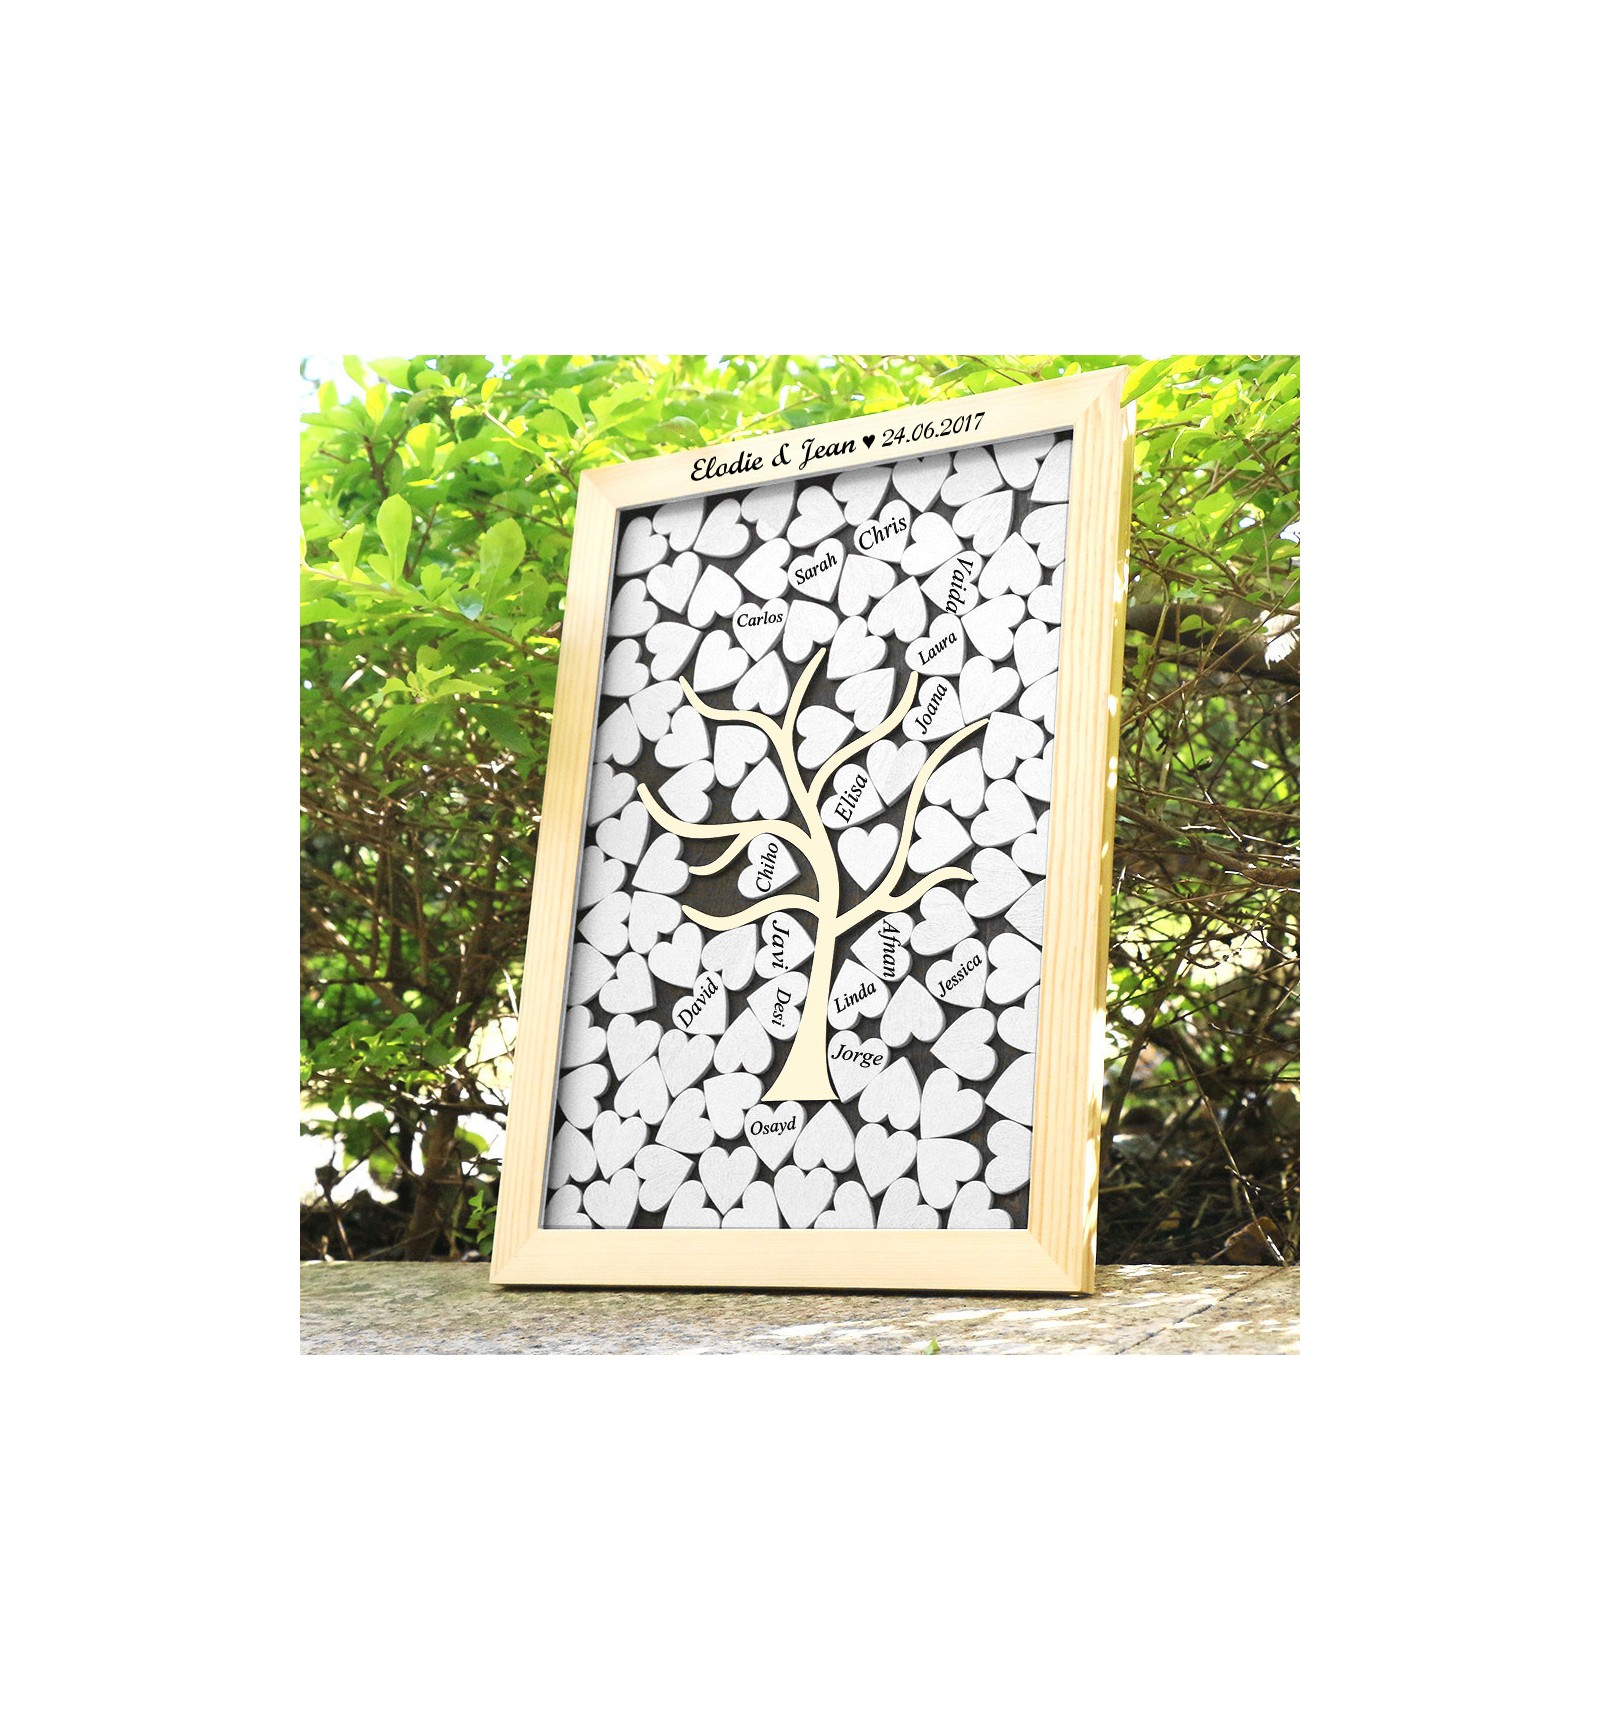 livre d 39 or cadre c urs en bois livre d 39 or tableau avec coeurs en bois. Black Bedroom Furniture Sets. Home Design Ideas